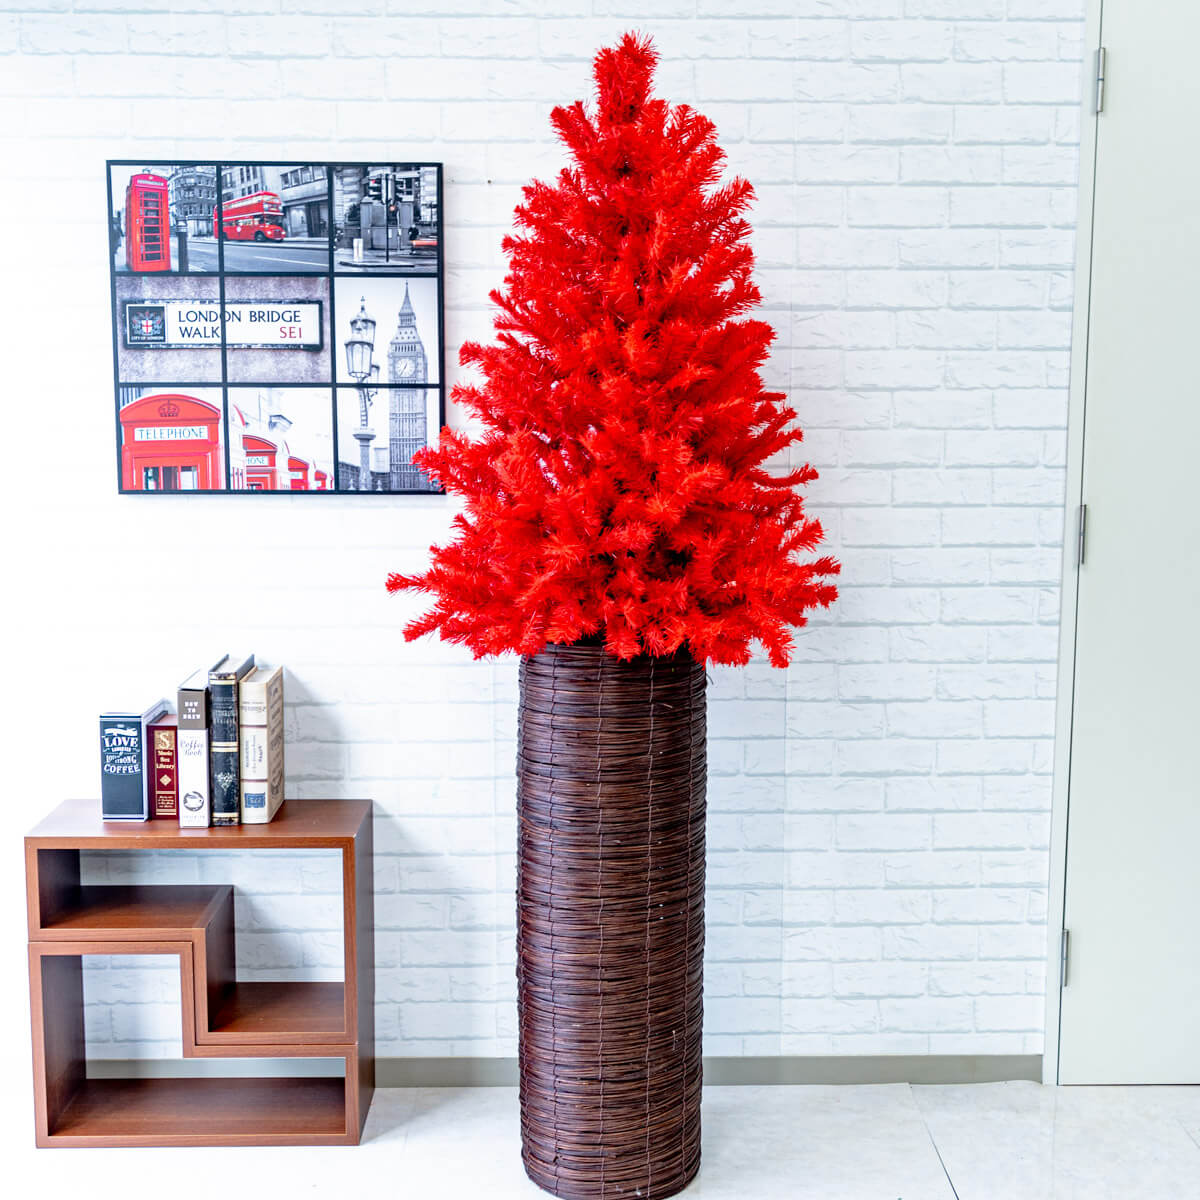 【PCH071 クリスマスツリーアレンジ/レッドツリー/シリンダーバスケットスタンド90】クリスマス装飾 クリスマスツリー デコレーション オーナメント 飾り 冬装飾 送料無料